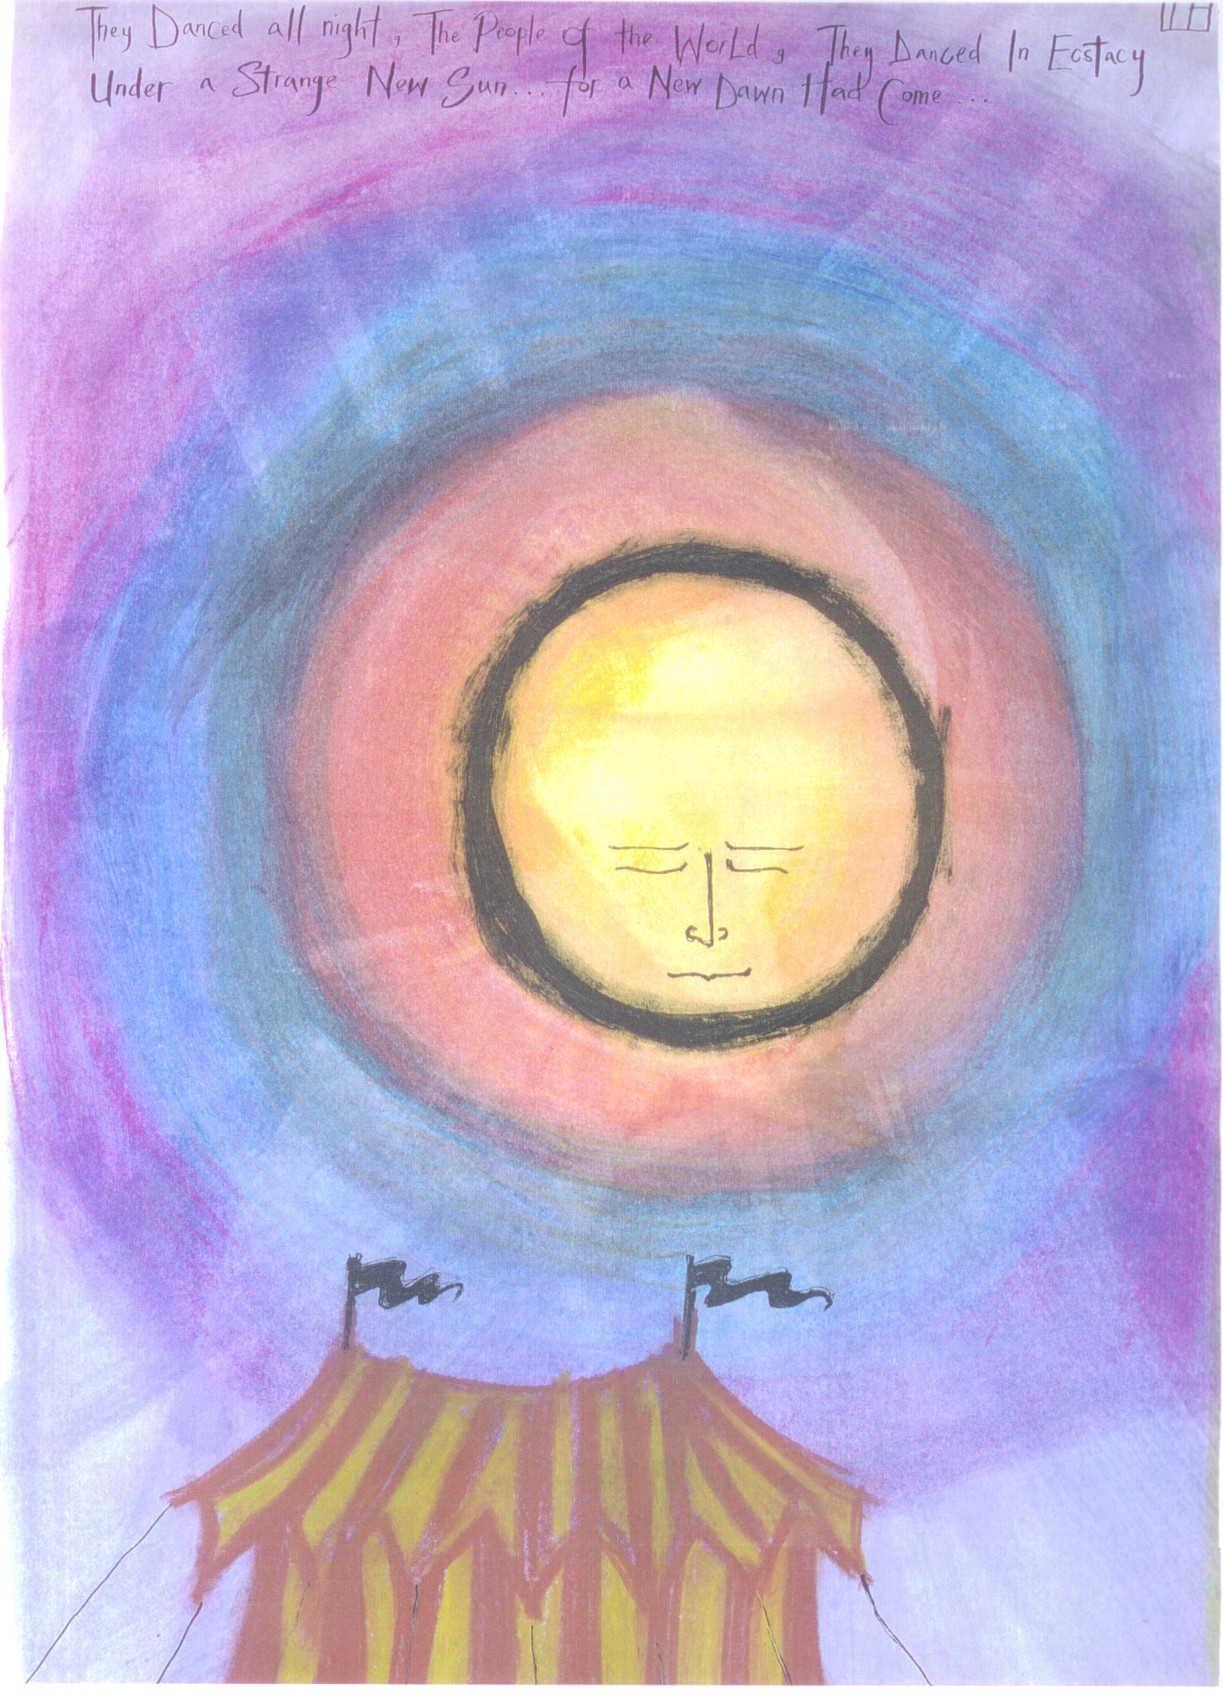 Sun Dance painting